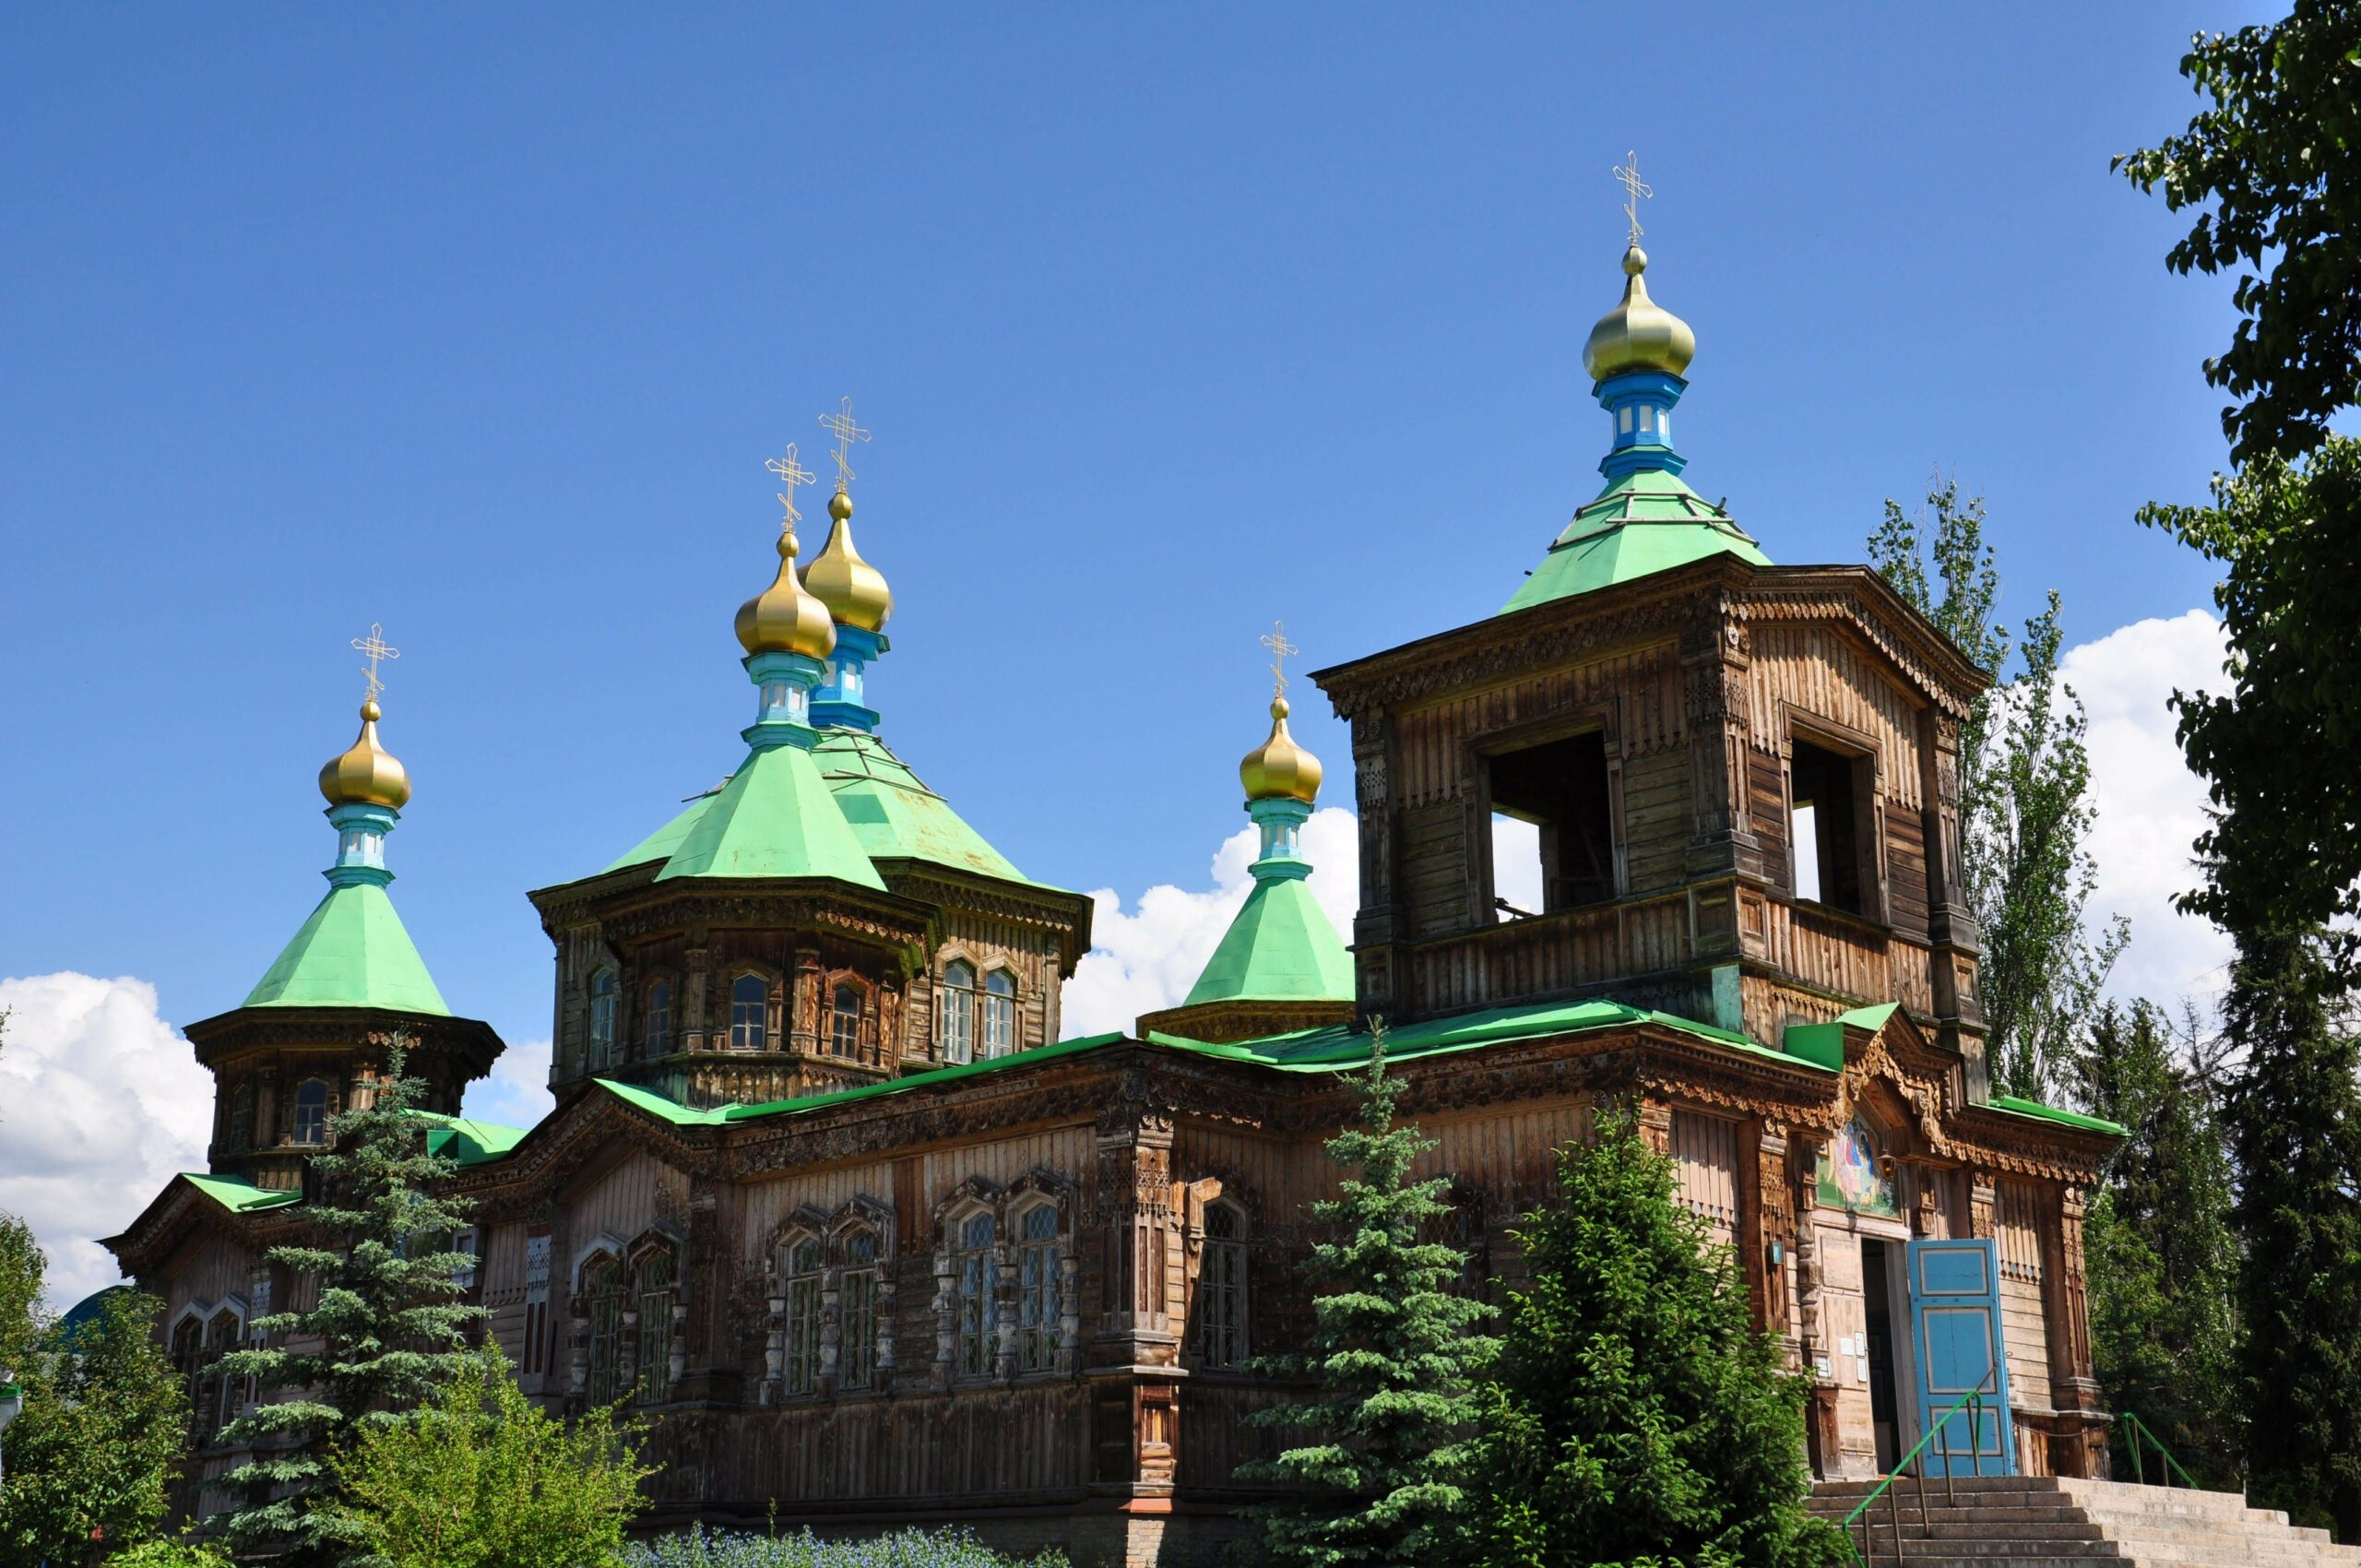 Kirgistan - rondreis Kirgizië in 18 dagen - Karakol